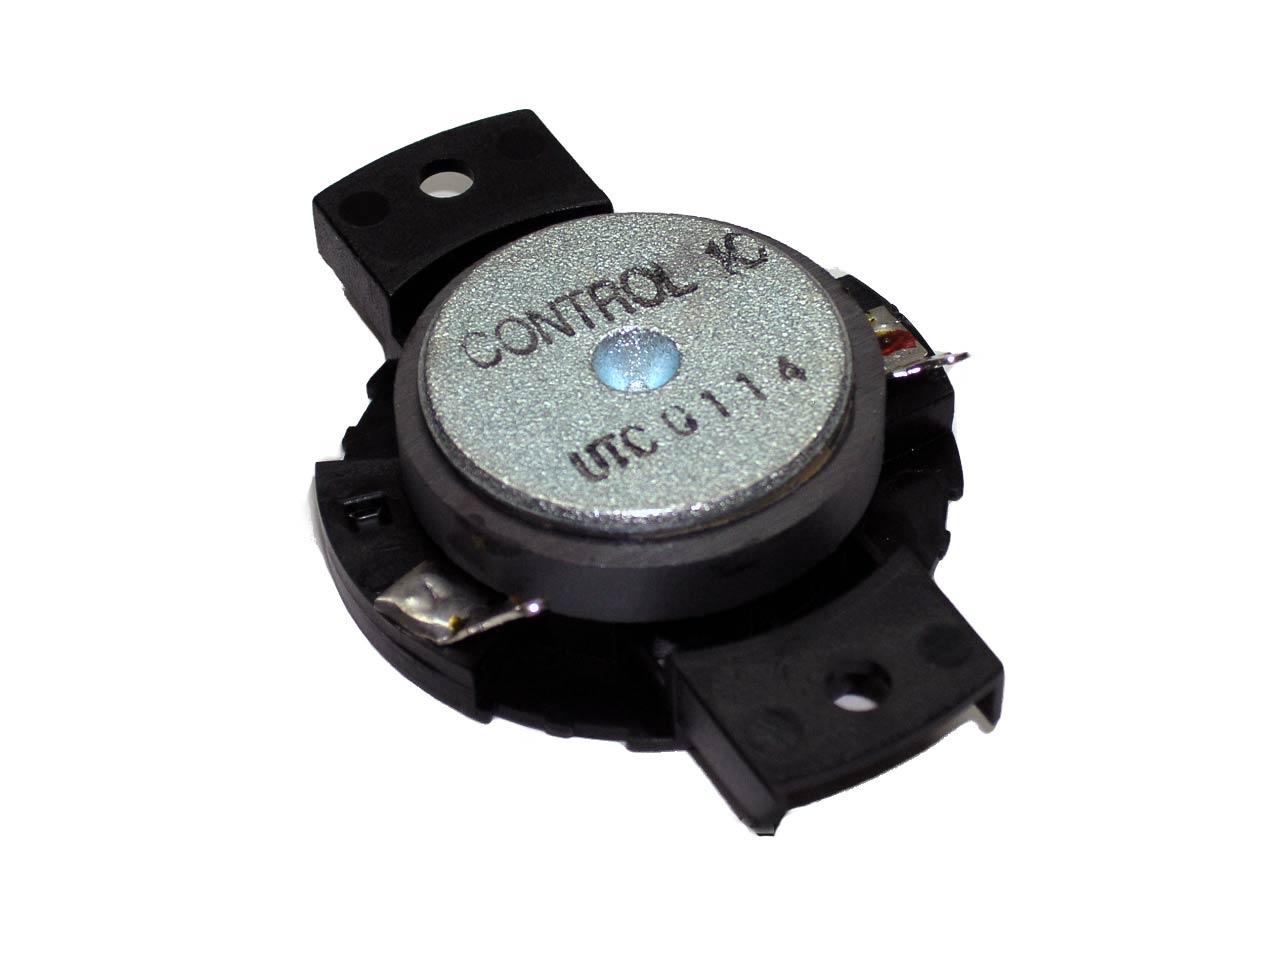 JBL Factory Replacement Tweeter, 4 Ohms, Control 1, C1002C